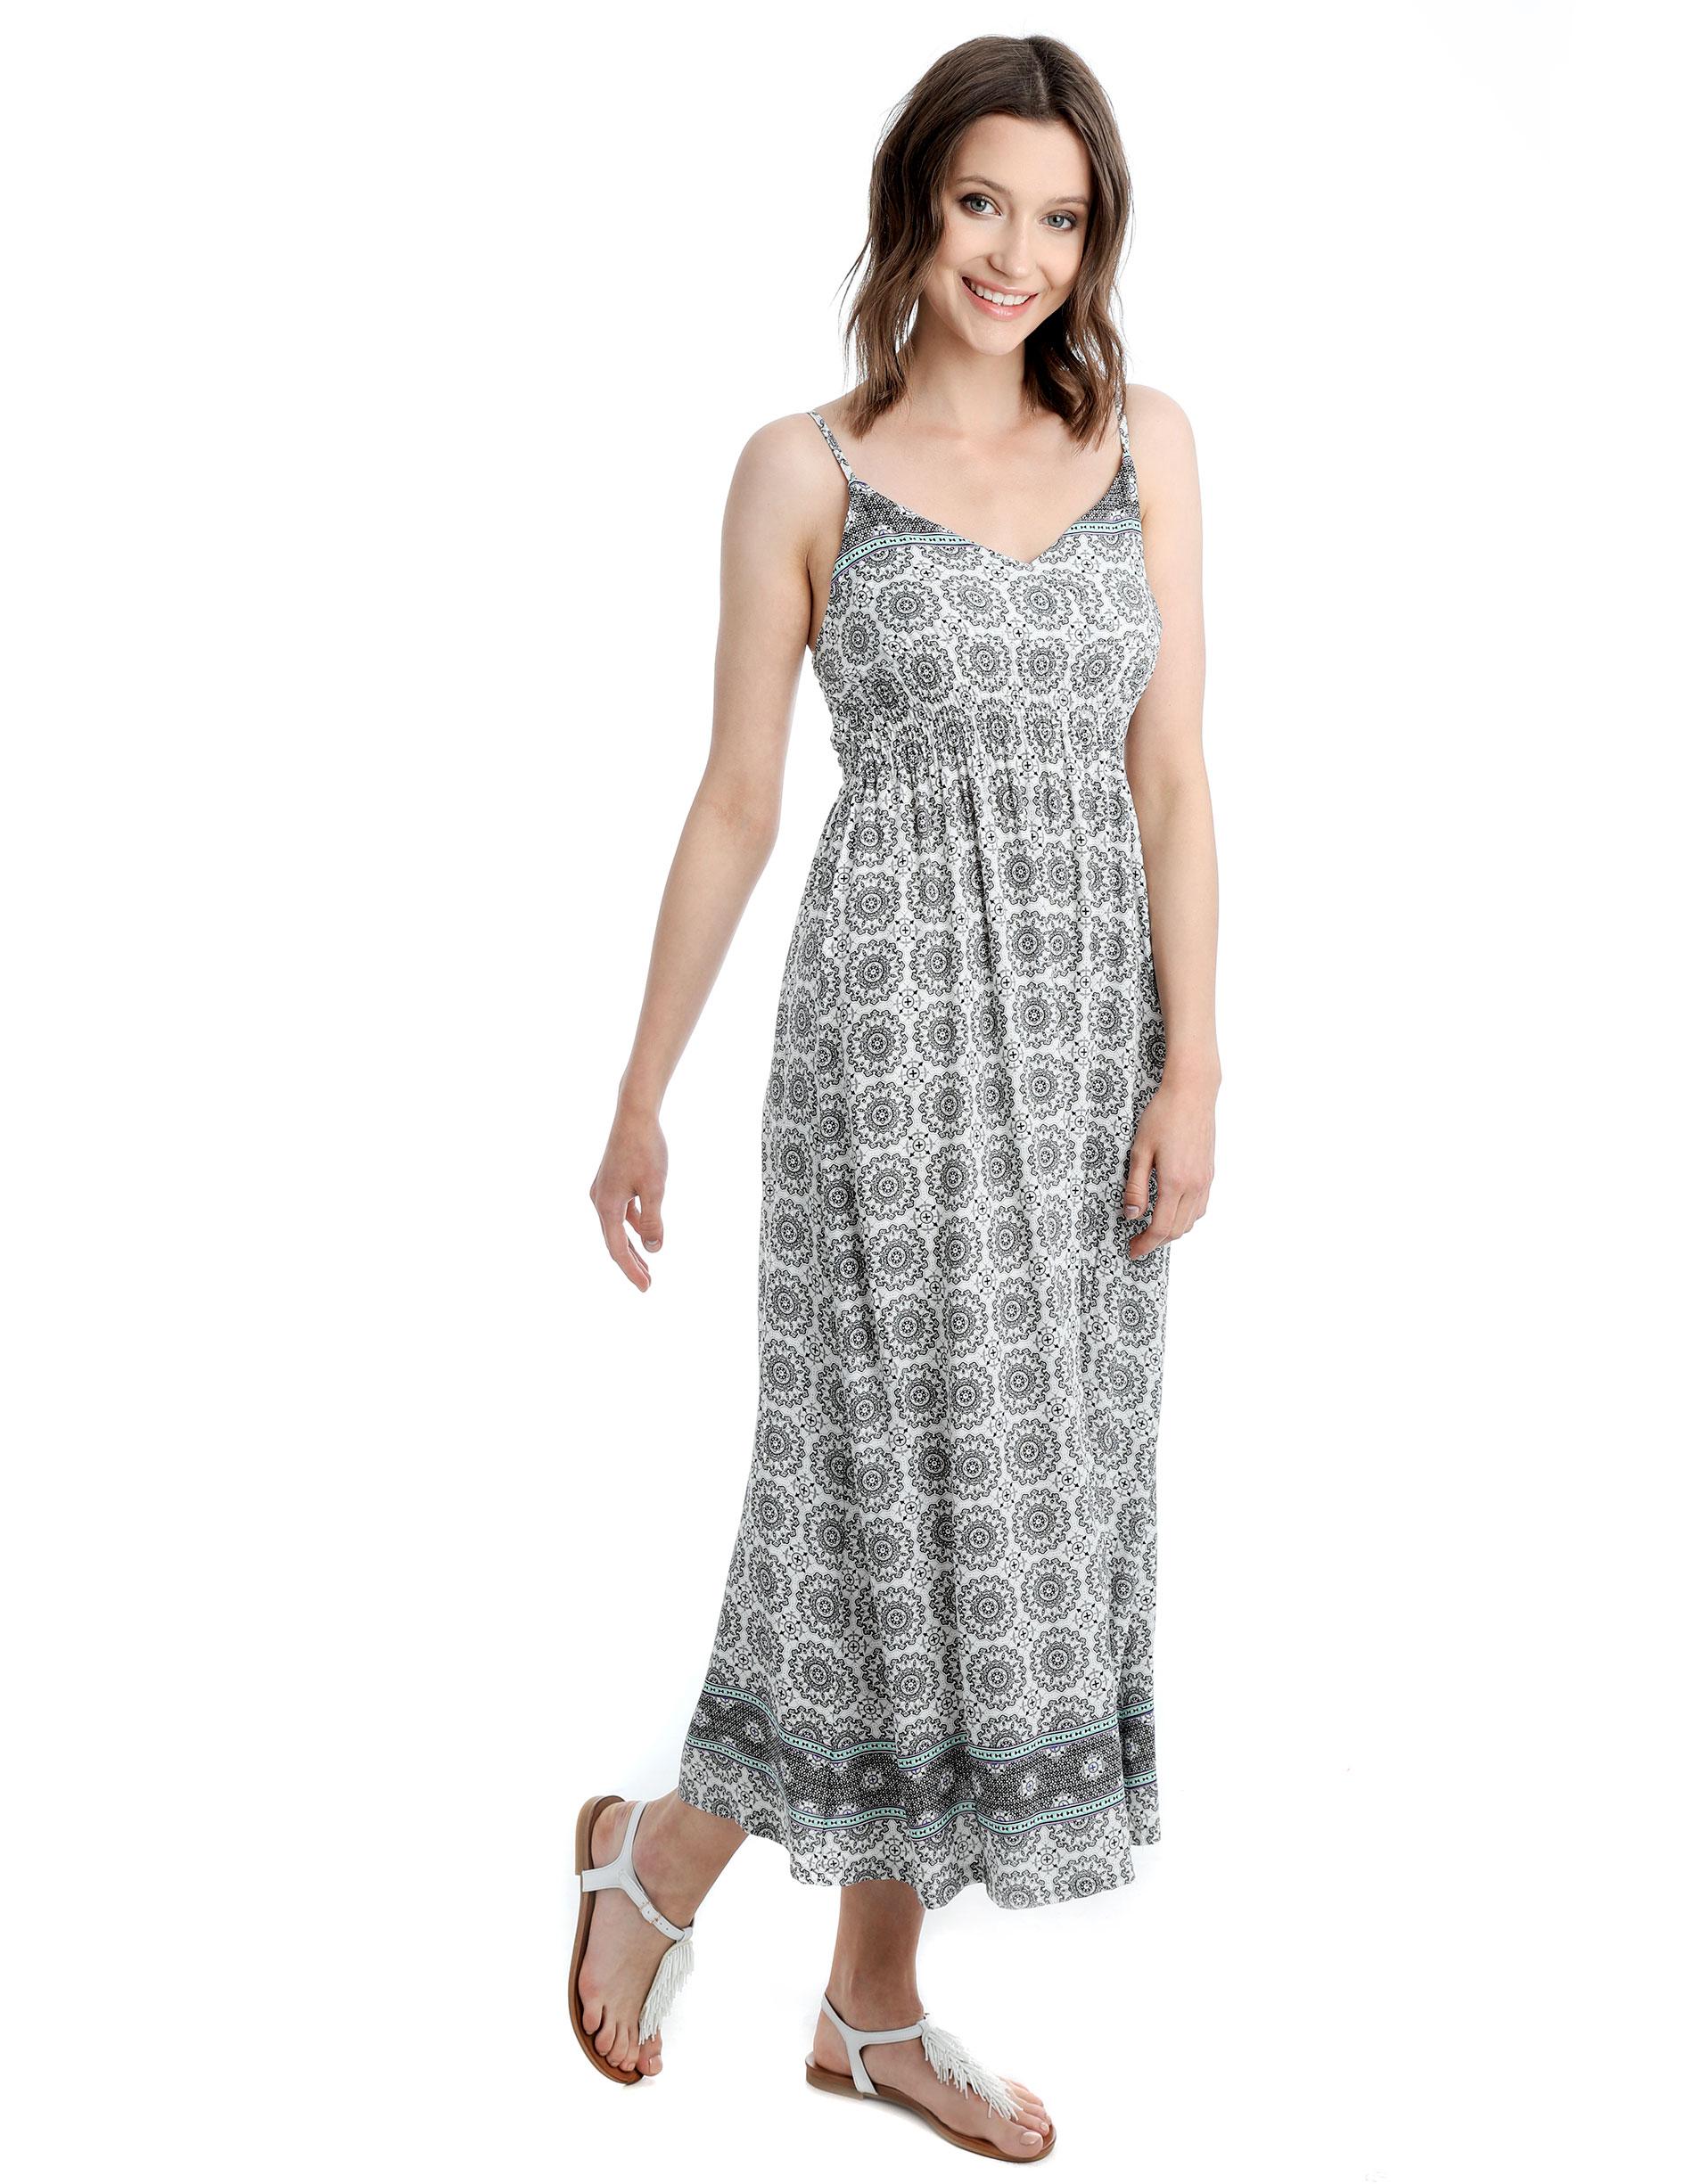 Sukienka - 91-1038 BIANC - Unisono